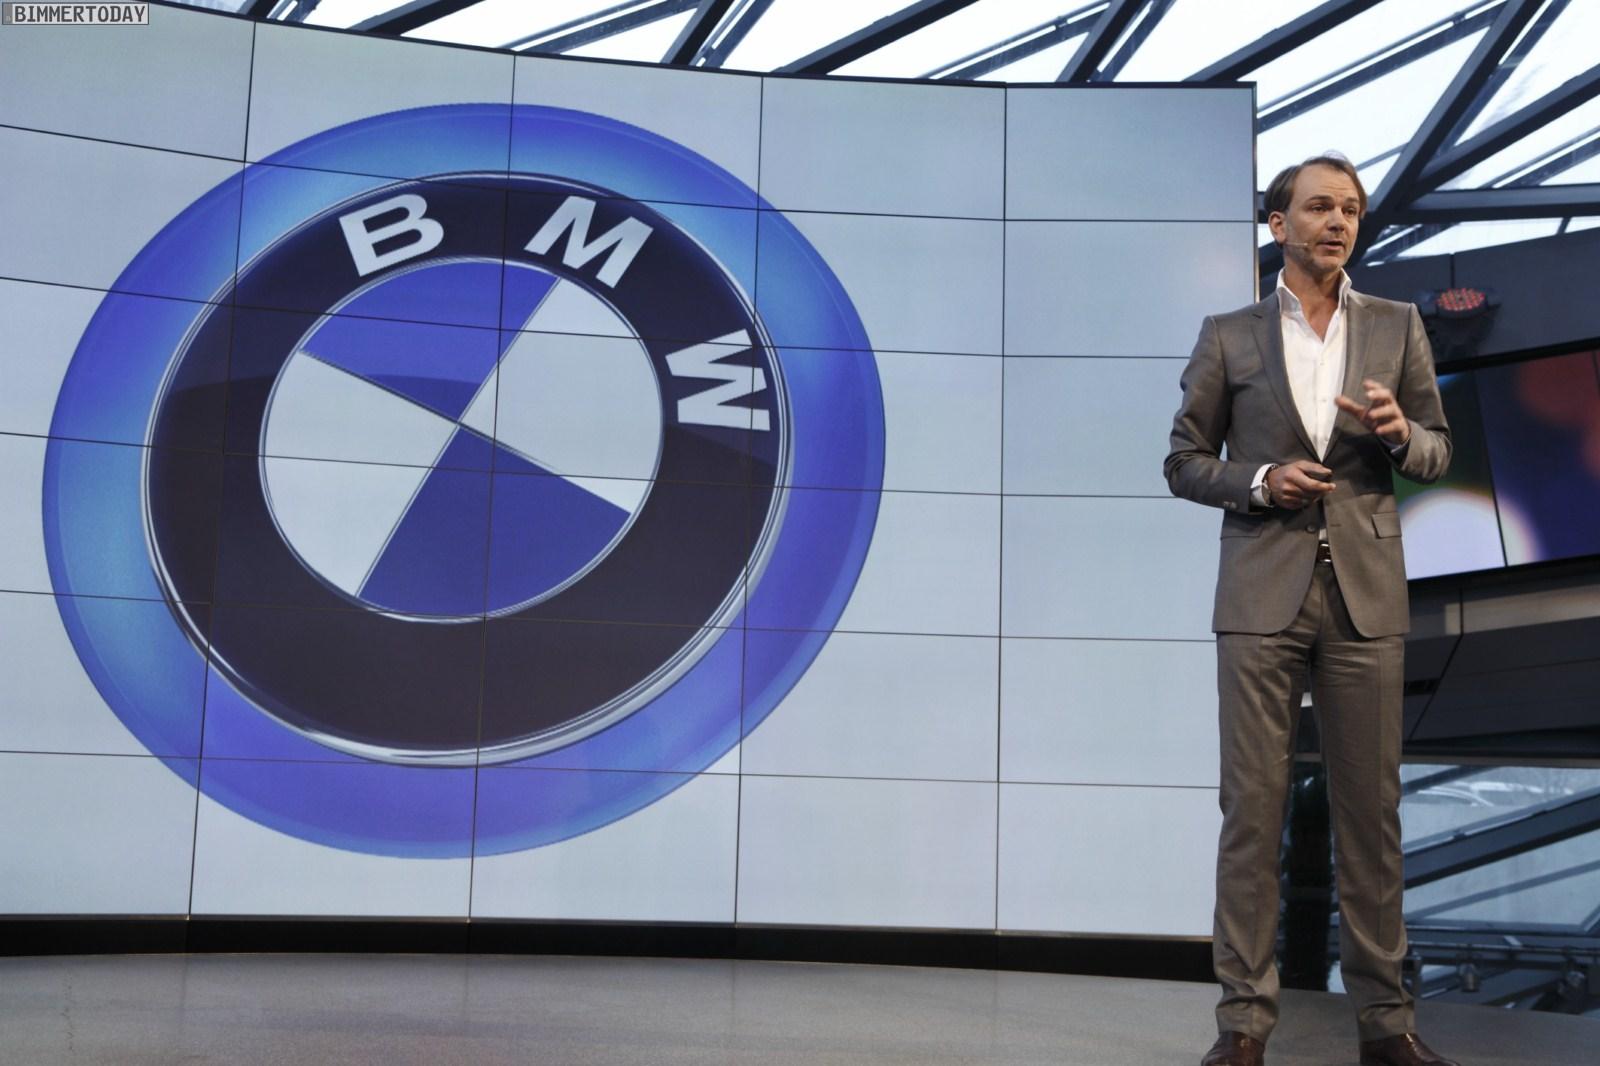 BMW i Pressekonferenz BMW Welt Fotos 04